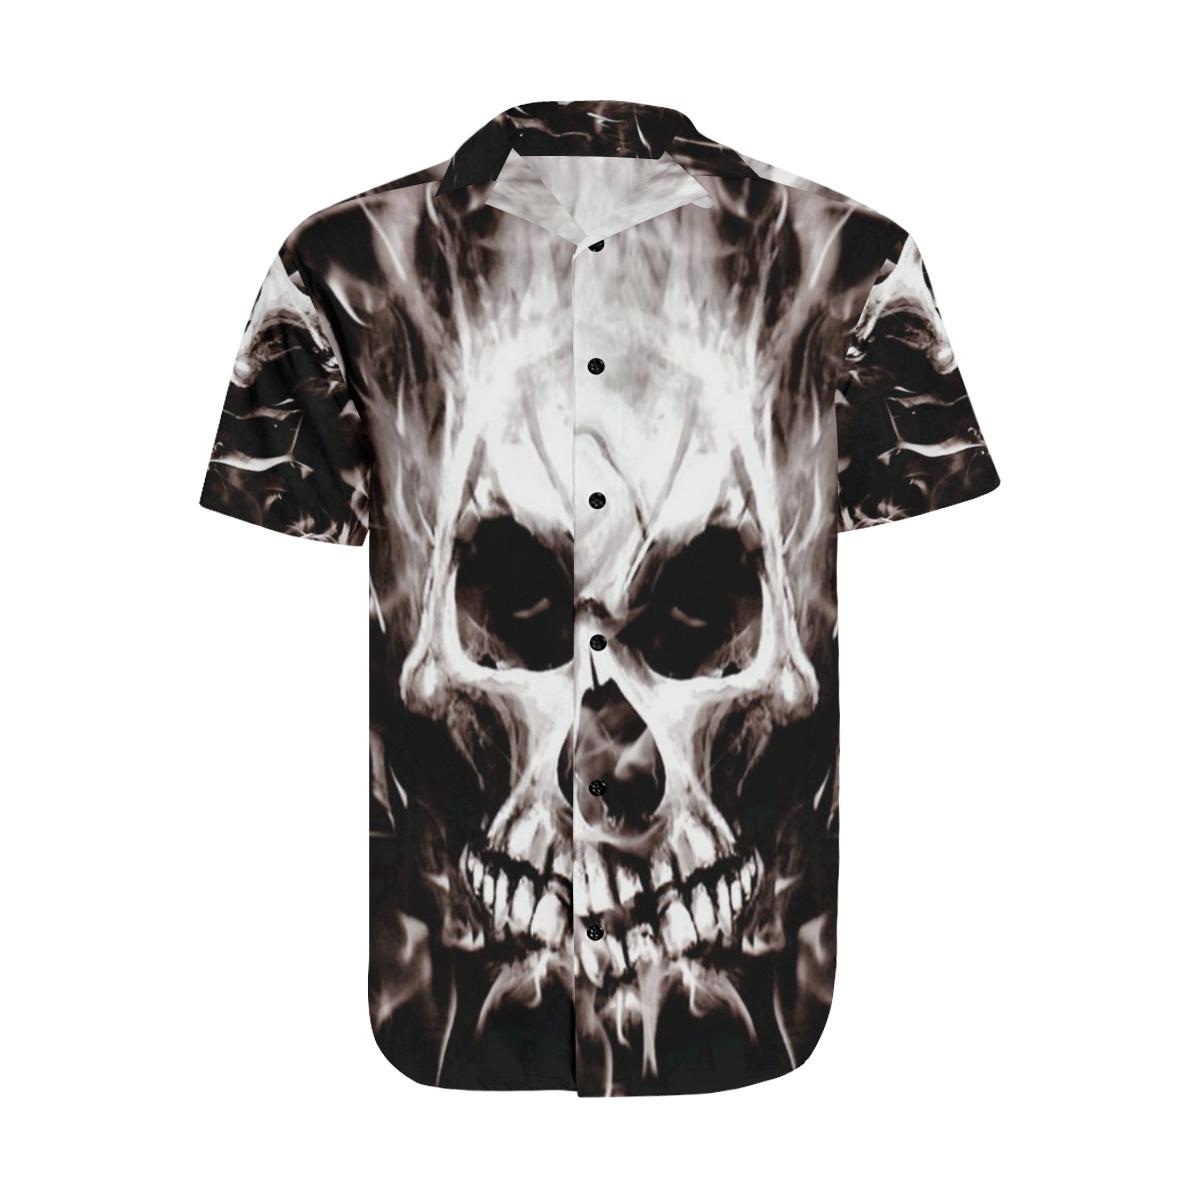 Gothic Skulls Satin Dress Shirt Men's Short Sleeve Shirt with Lapel Collar (Model T54)